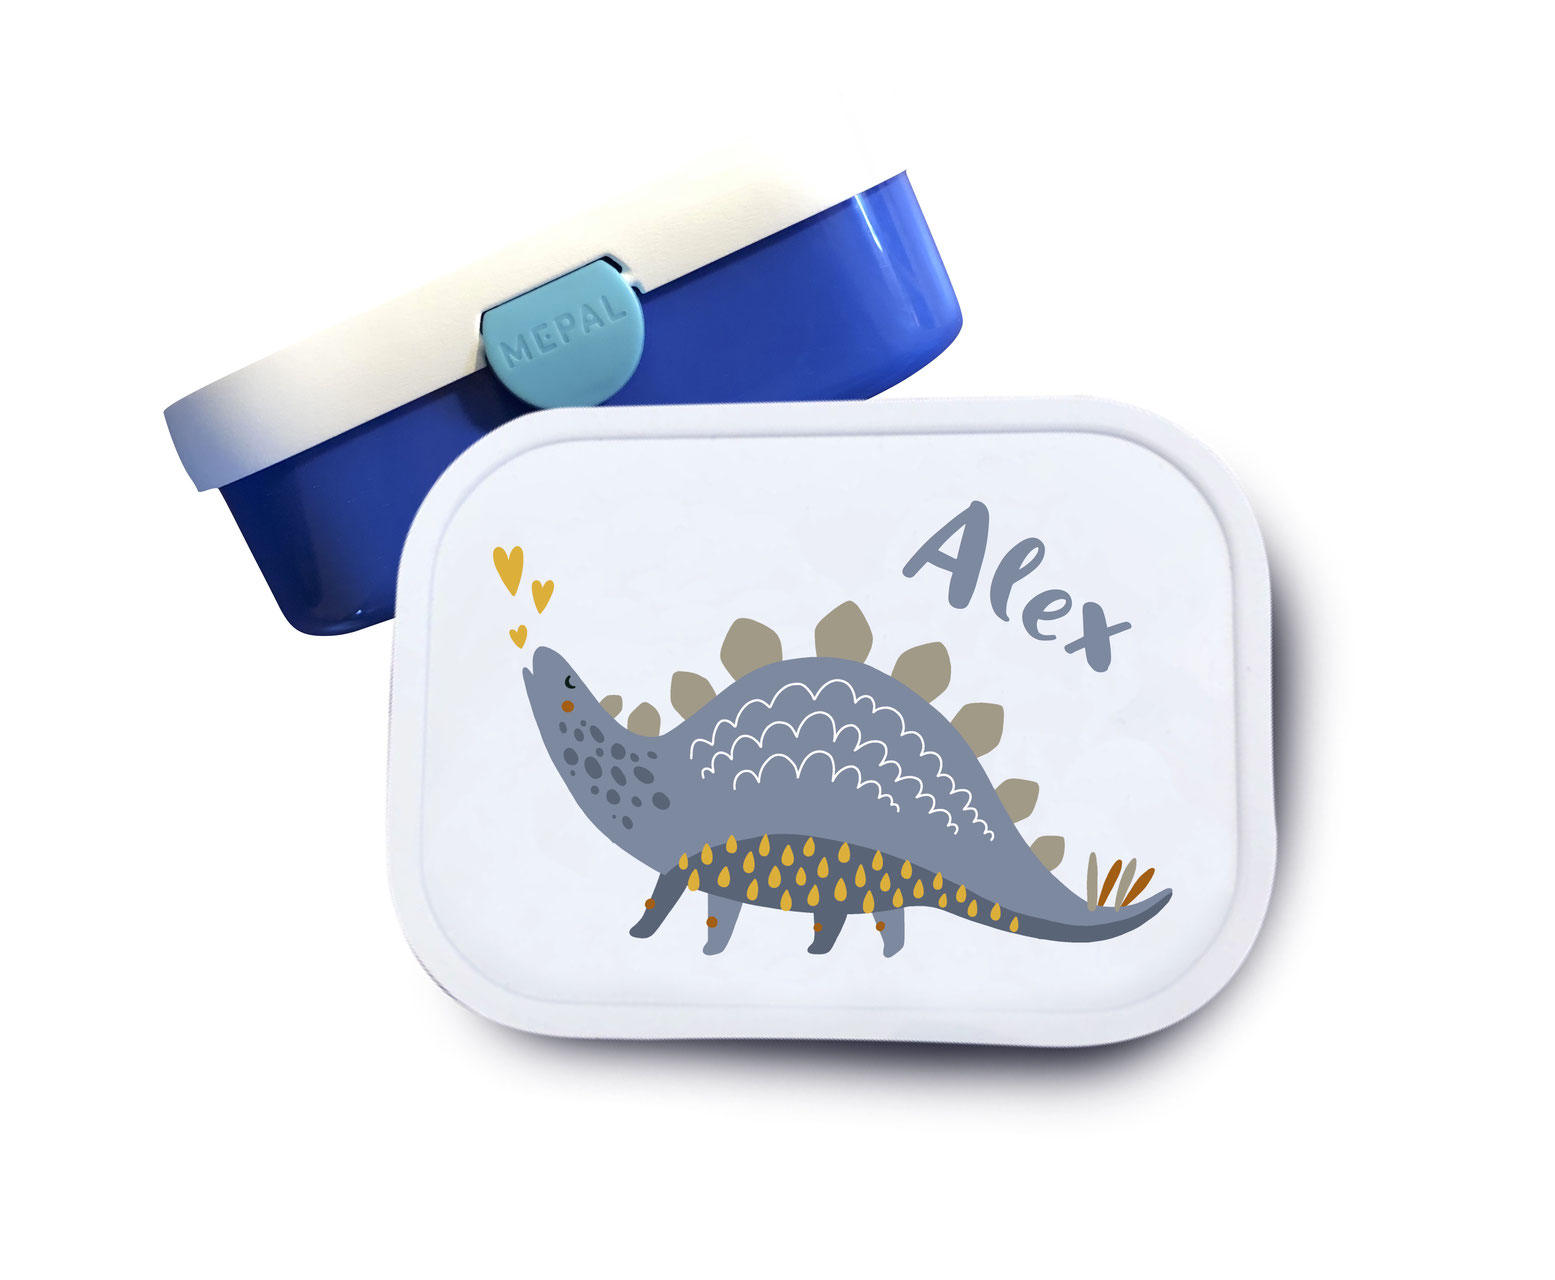 Brotdose mit Namen Dinosaurier